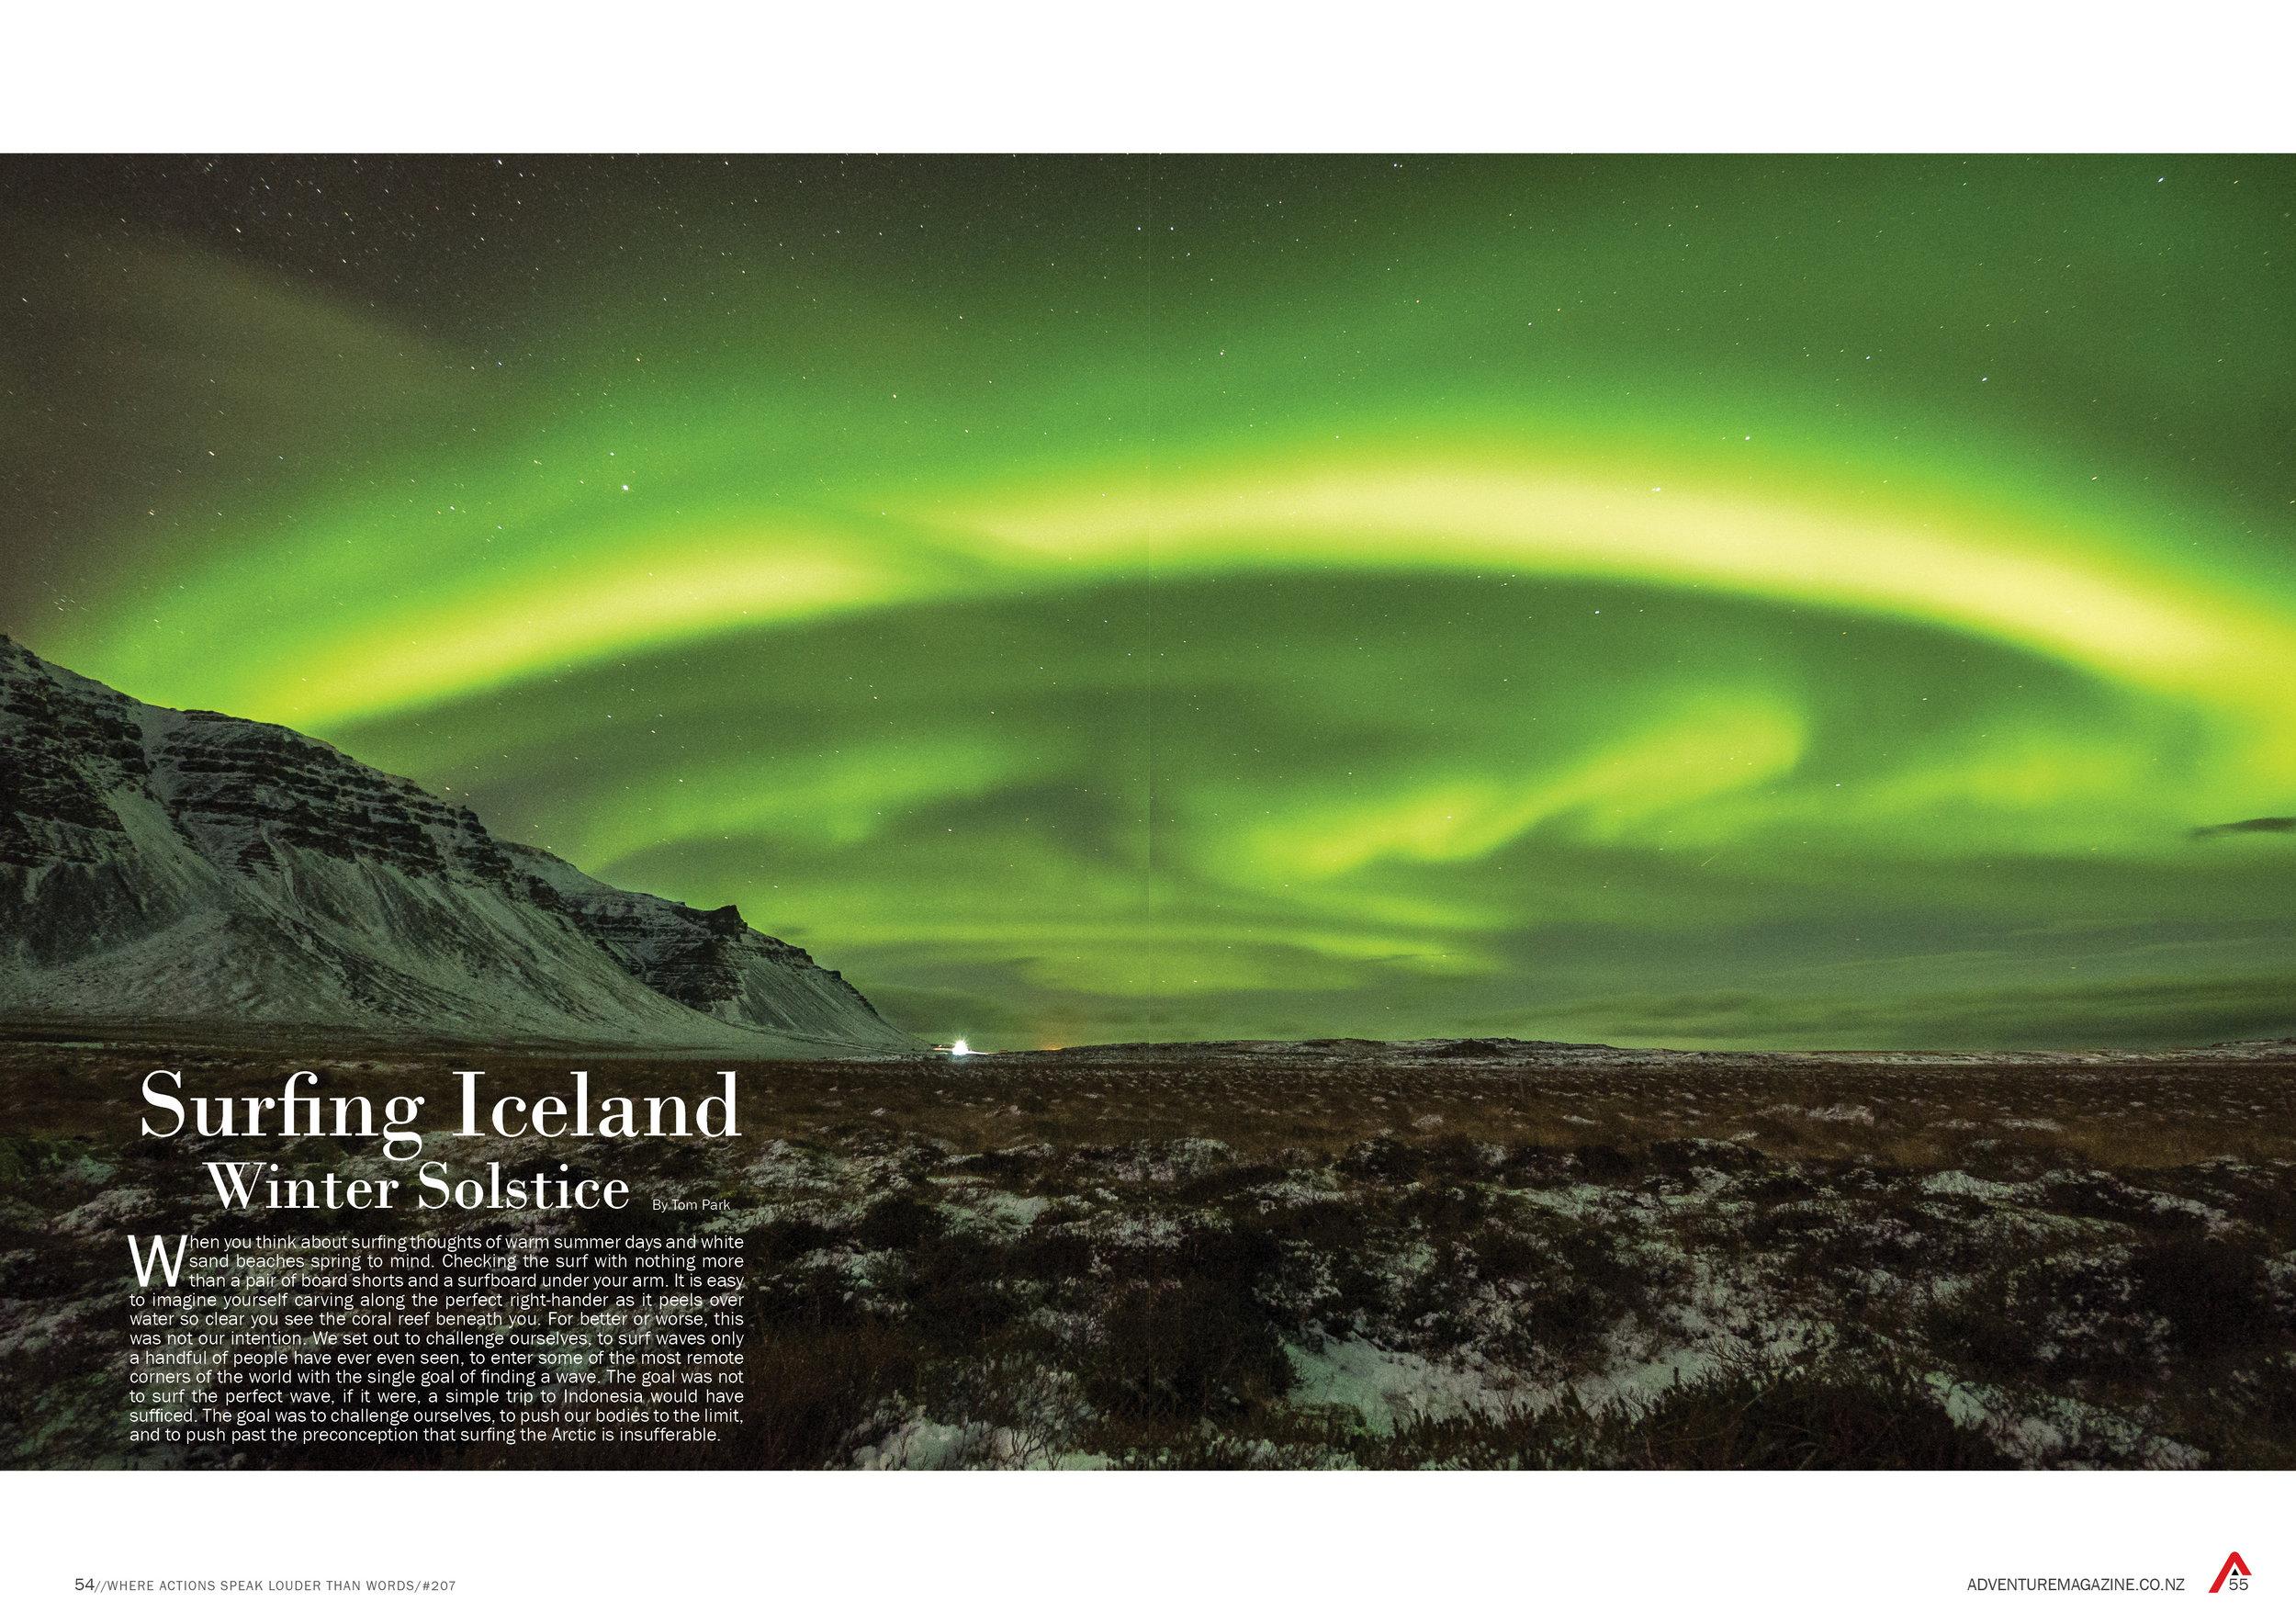 Publication in Adventure Magazine - Survival Edition